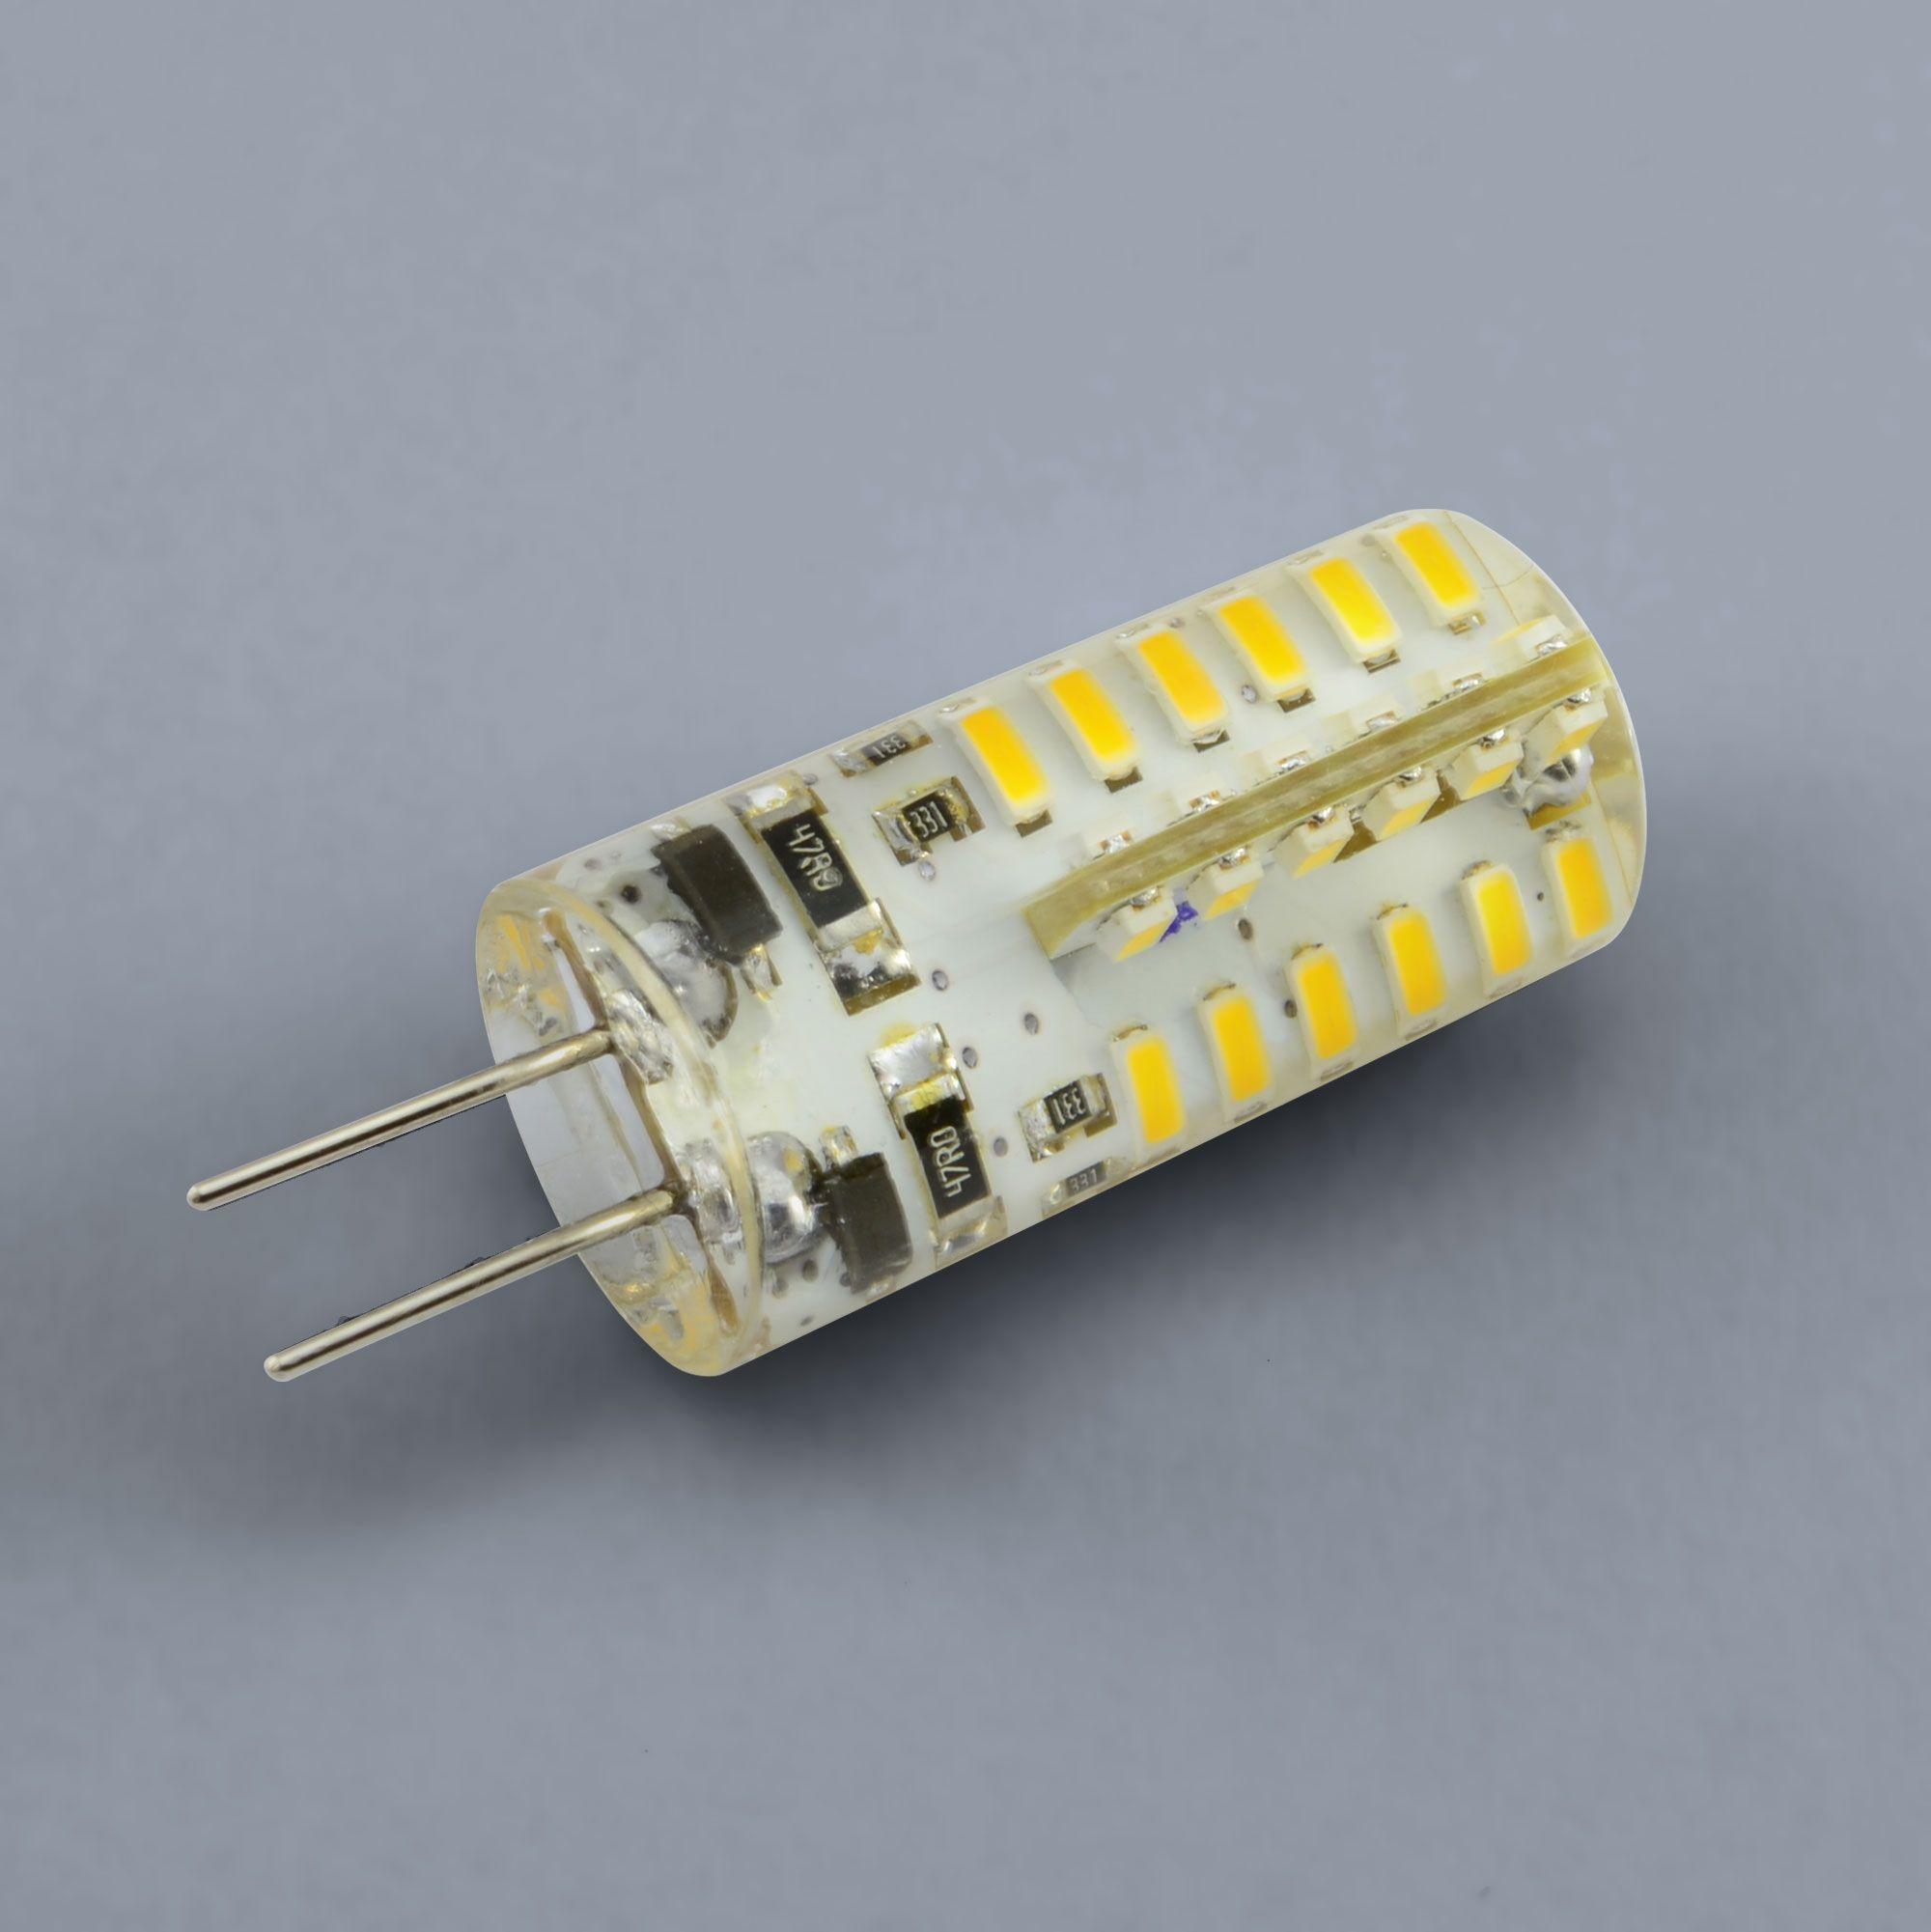 251dedf8d3d7ef6db89d32d21f5f4b21 Luxus Led Lampe 3 Watt Dekorationen